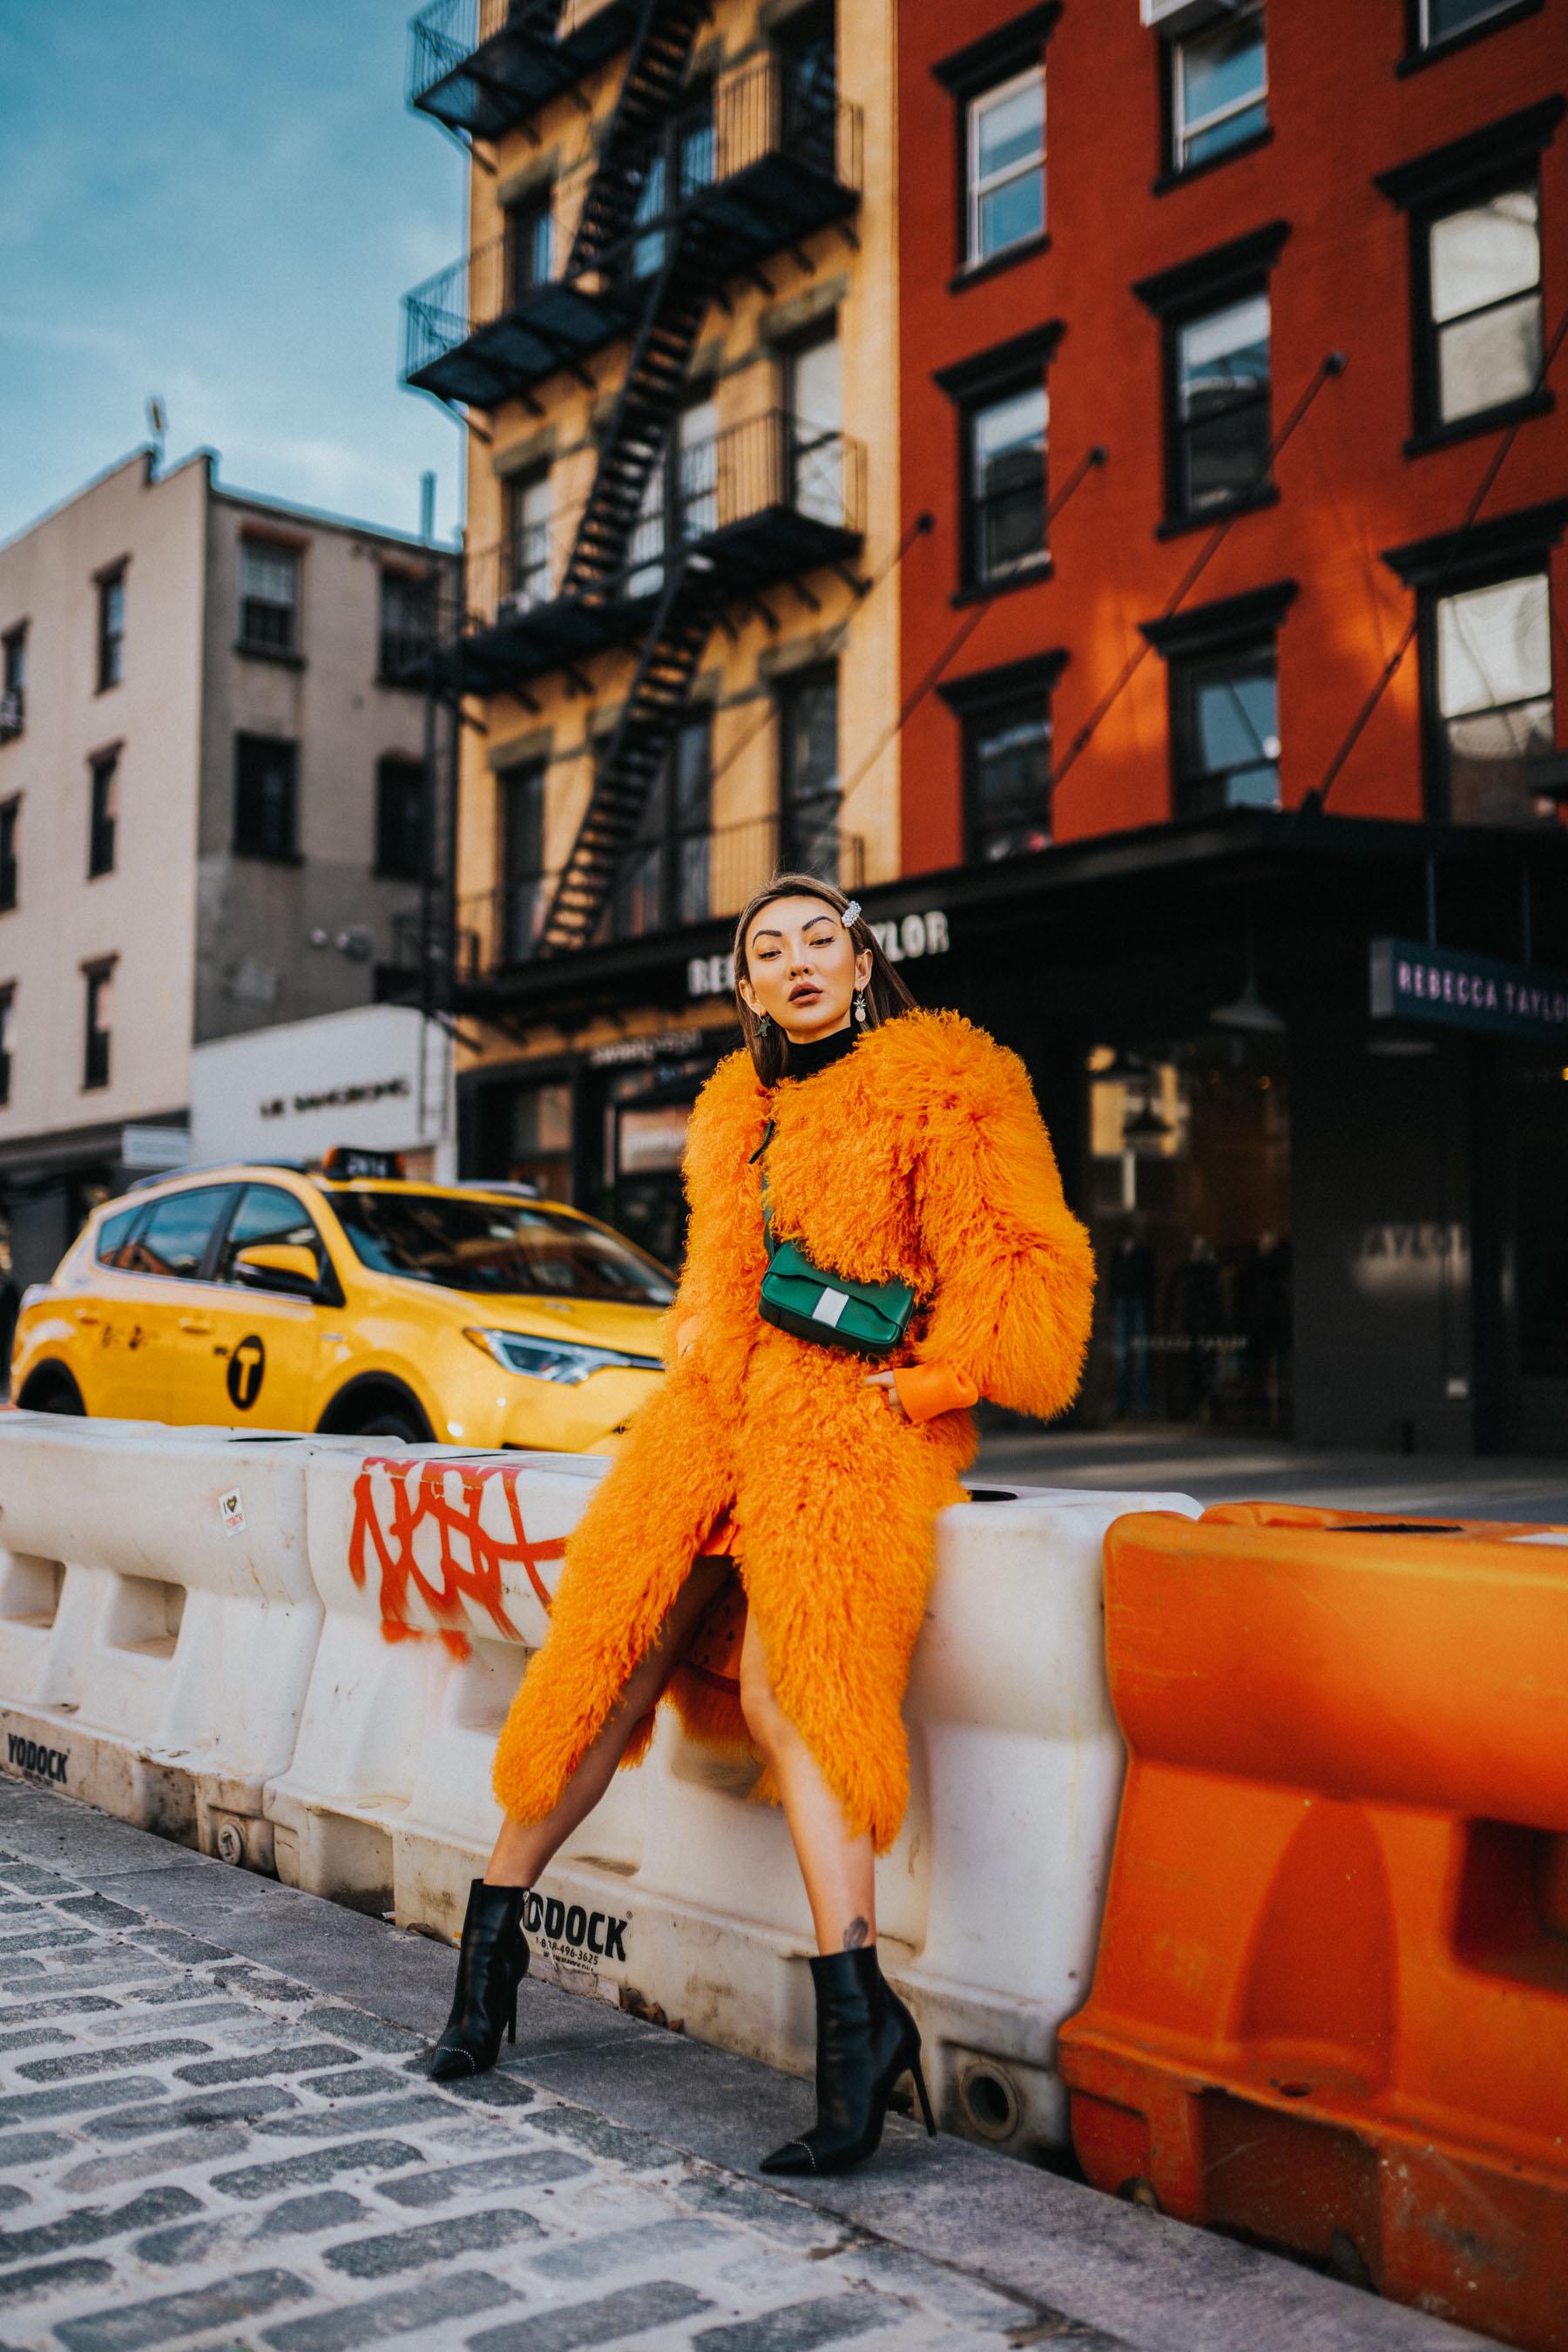 NYFW, How to wear a barrette, orange coat, black boots, green purse, pearl barrette // Notjessfashion.com